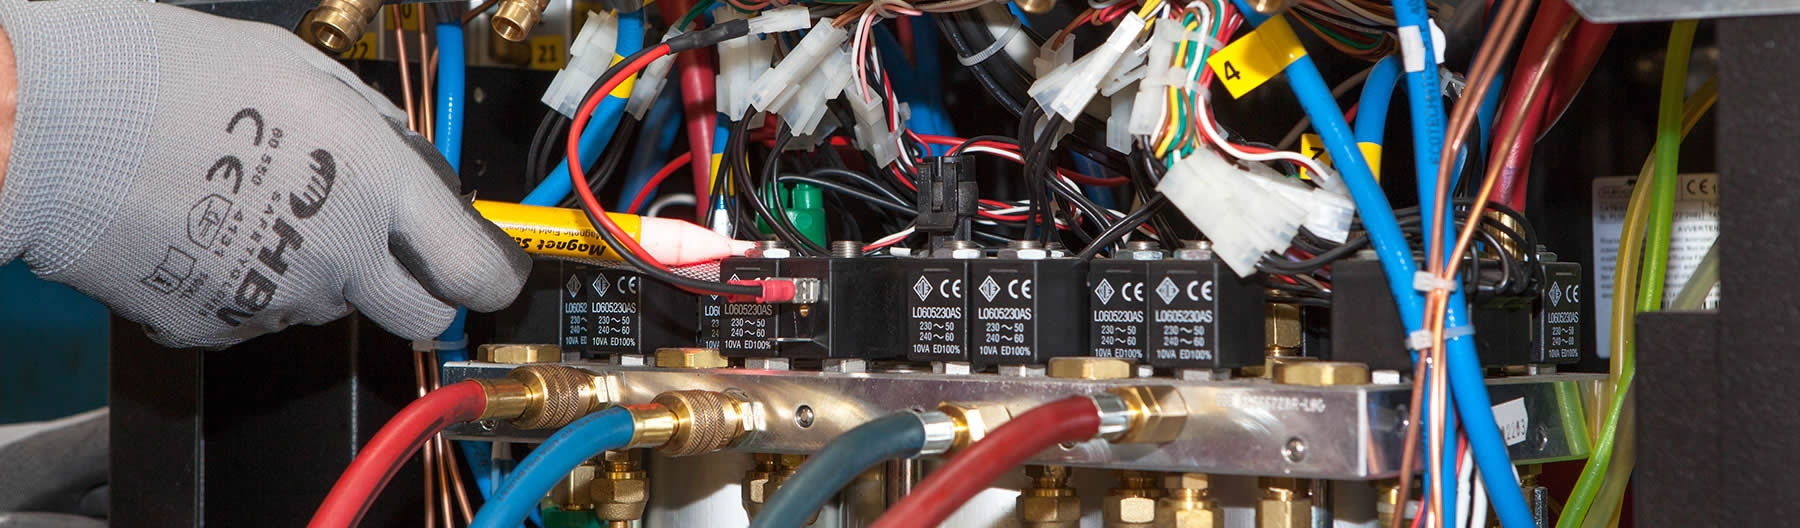 Overname koeltechniek - Marktlink Fusies & Overnames